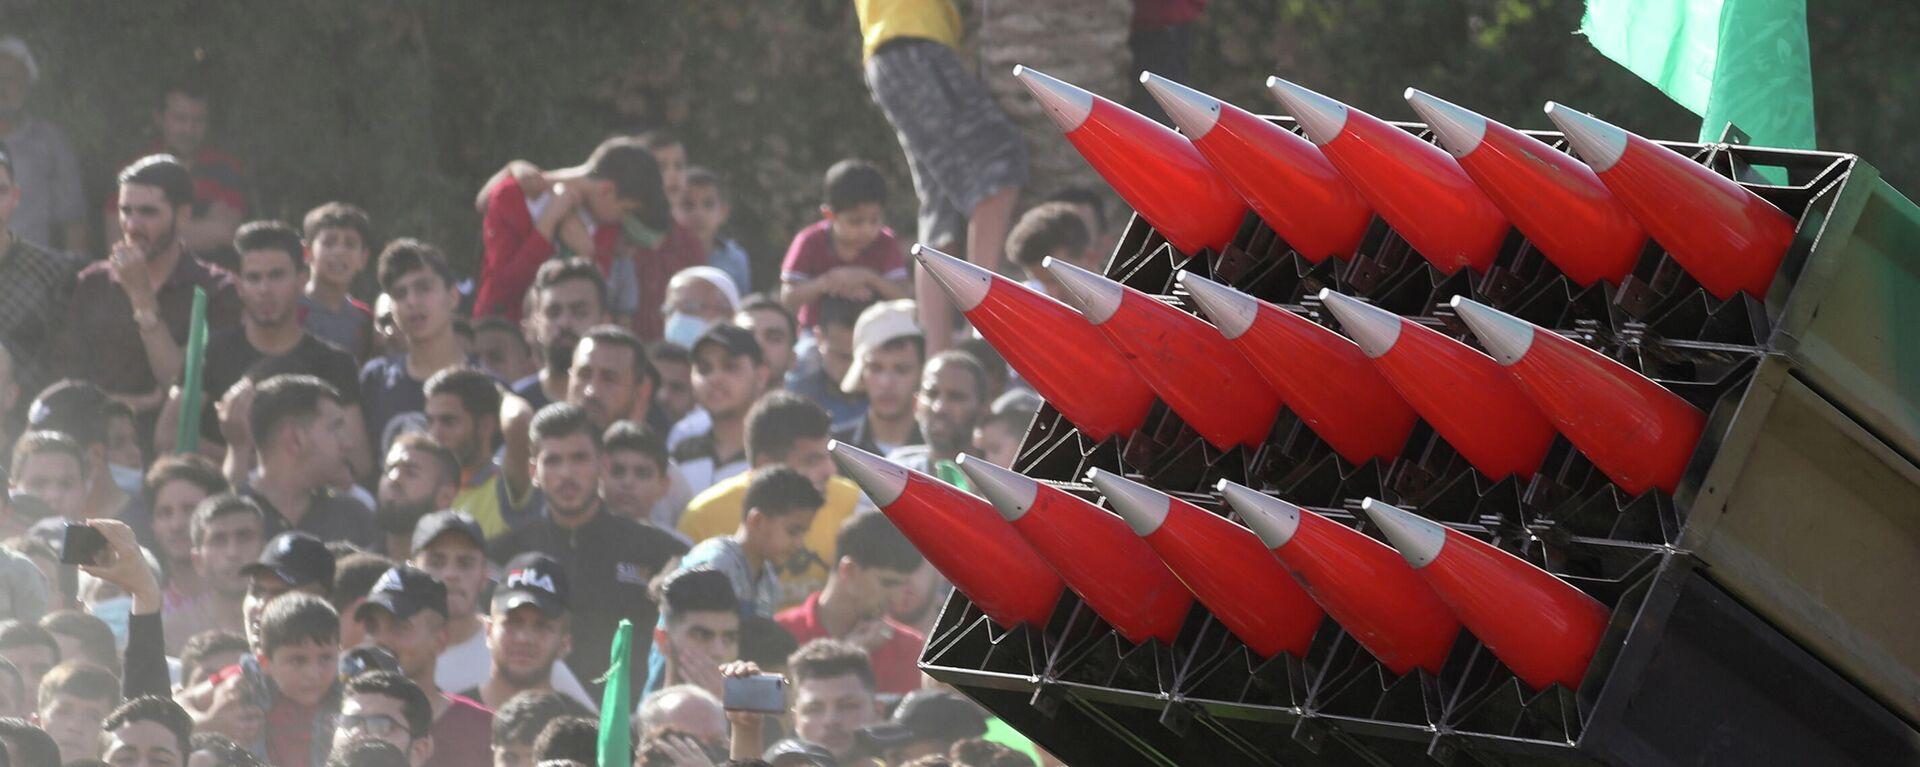 Una marcha anti-israelí en Gaza - Sputnik Mundo, 1920, 18.06.2021